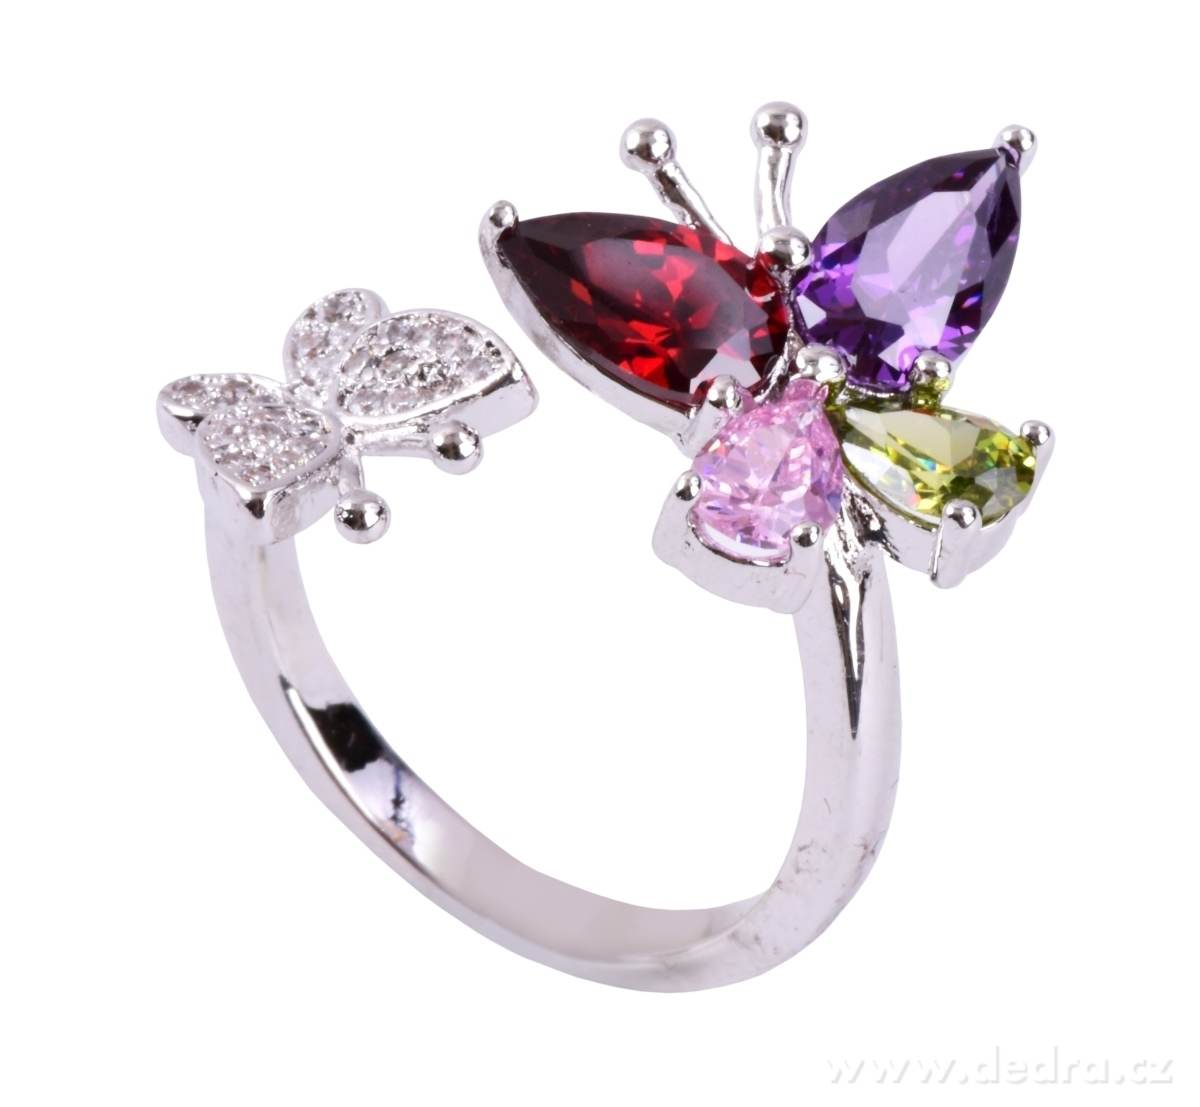 5736e0703 Prsten se zirkony rhodiováno - Vaše DEDRA - oficiálne stránky